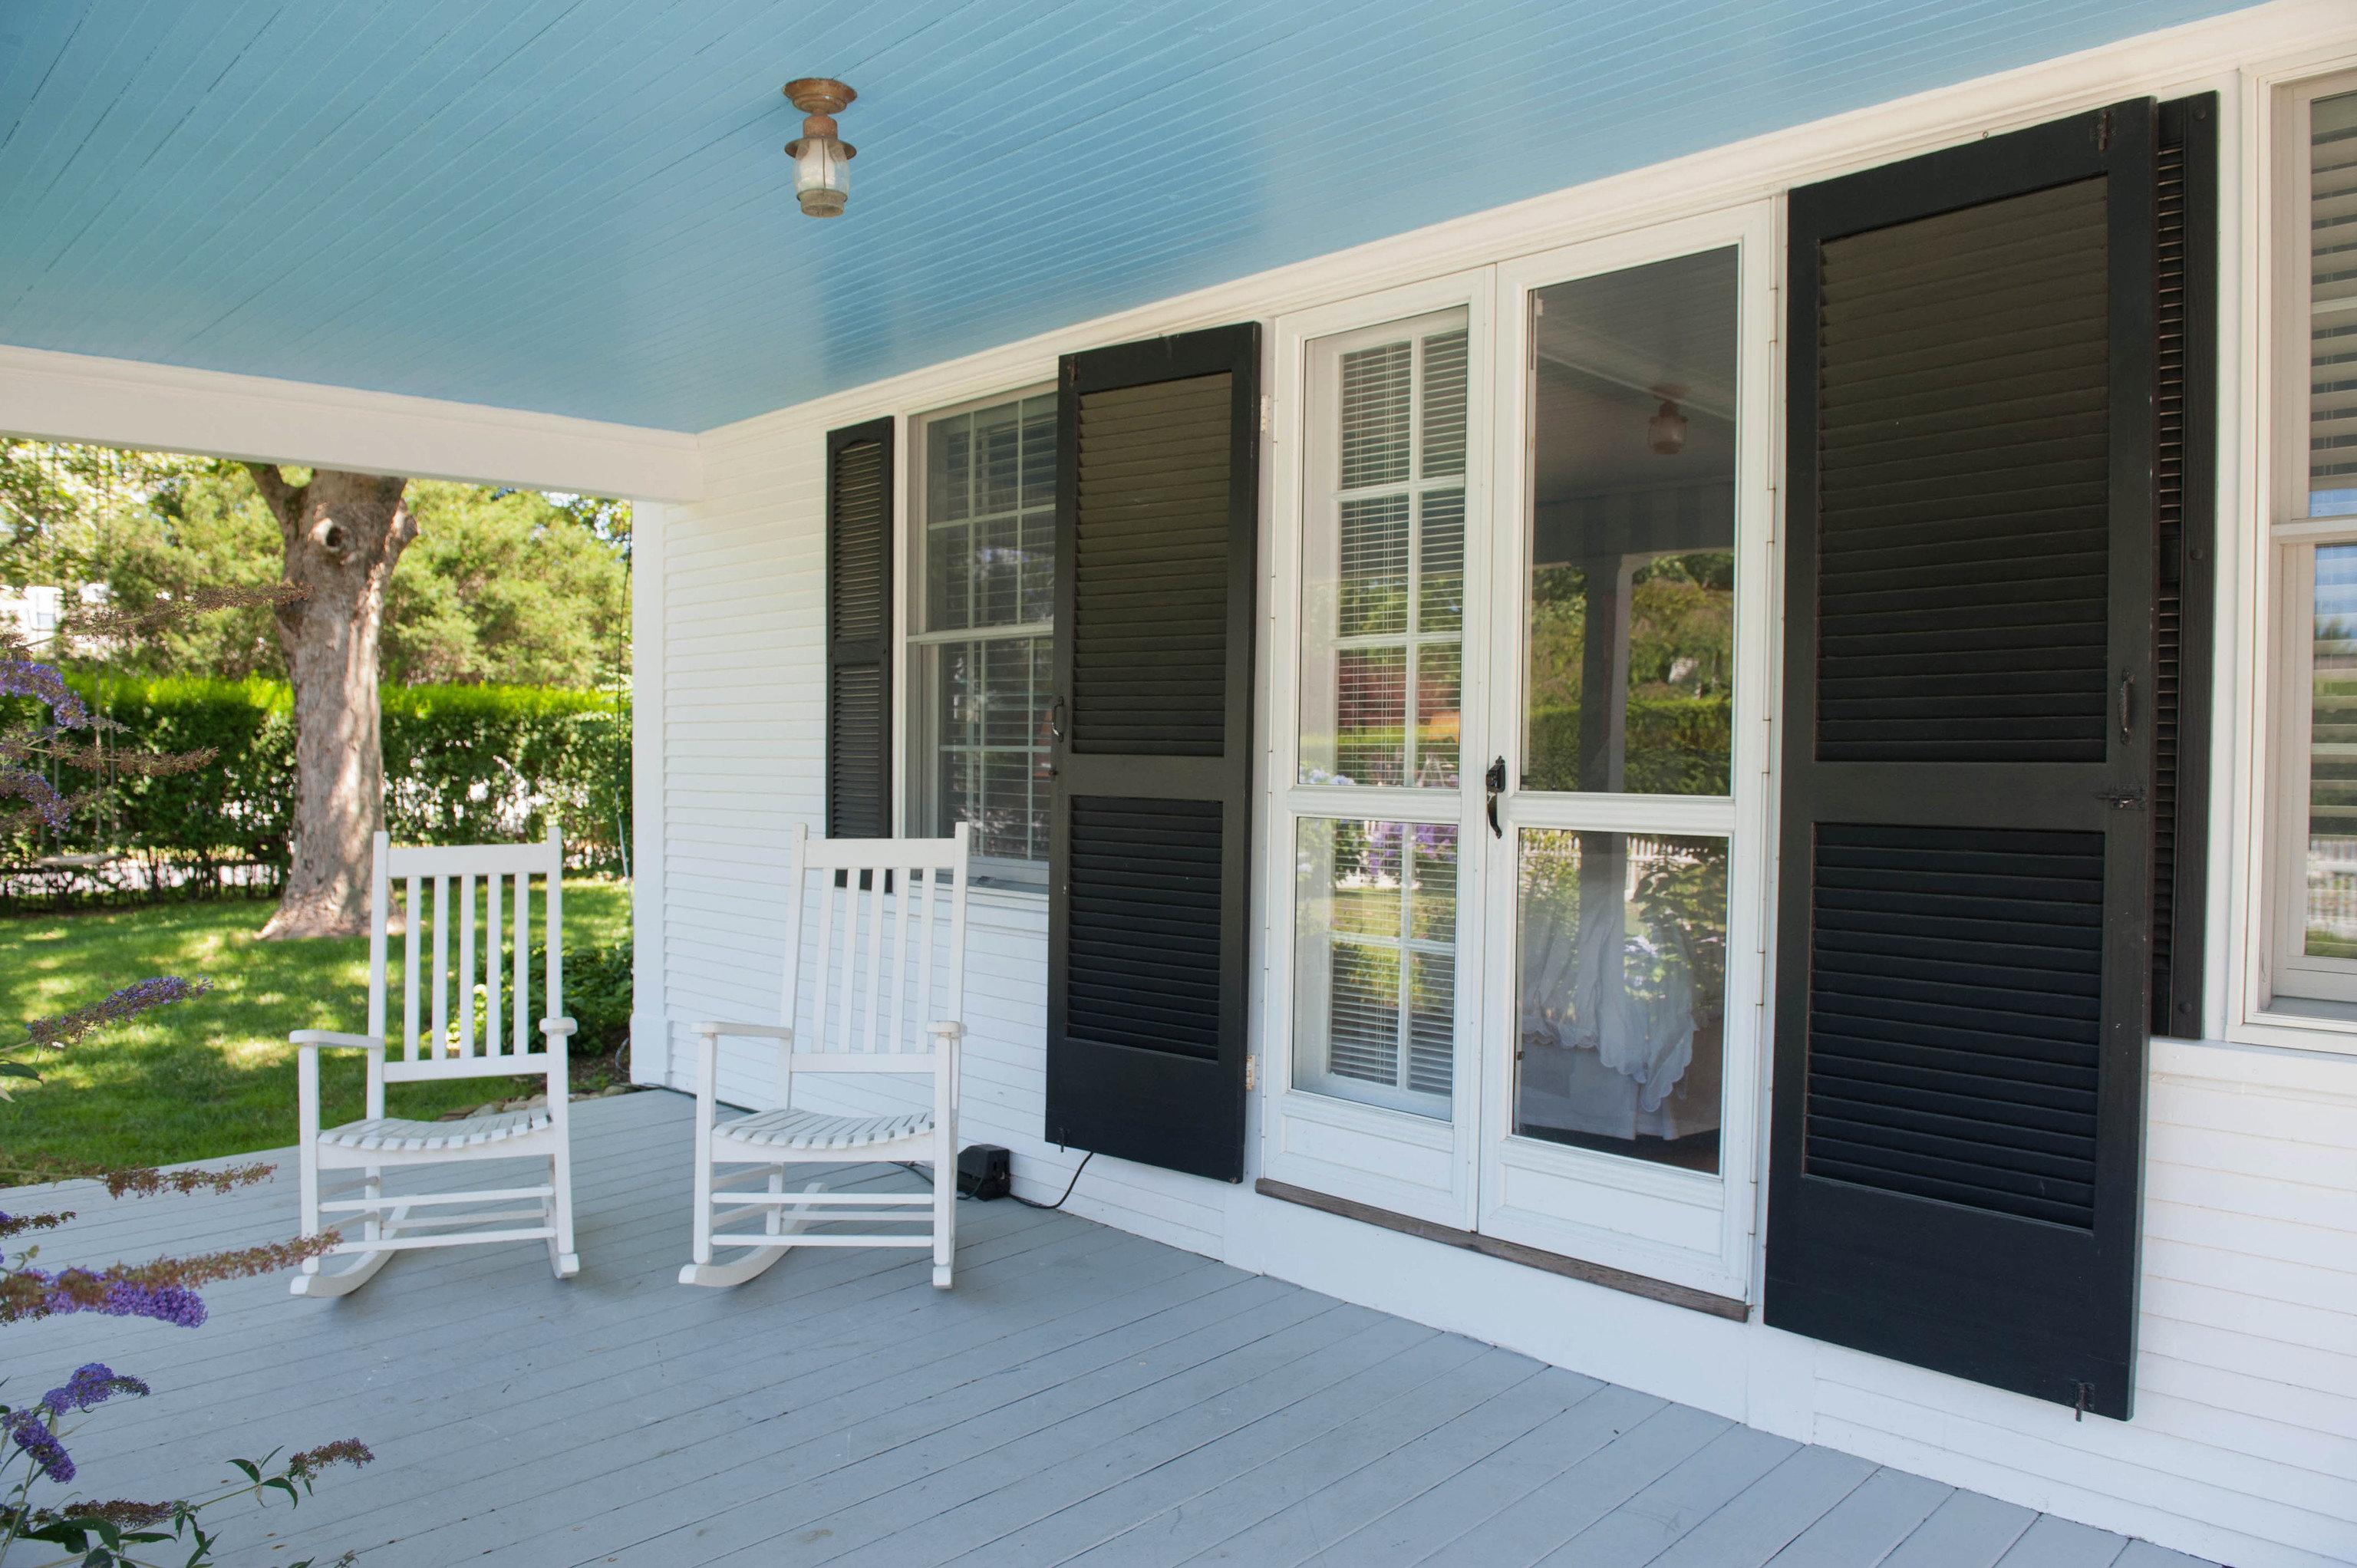 porch property building house home outdoor structure condominium siding door cottage Villa Deck